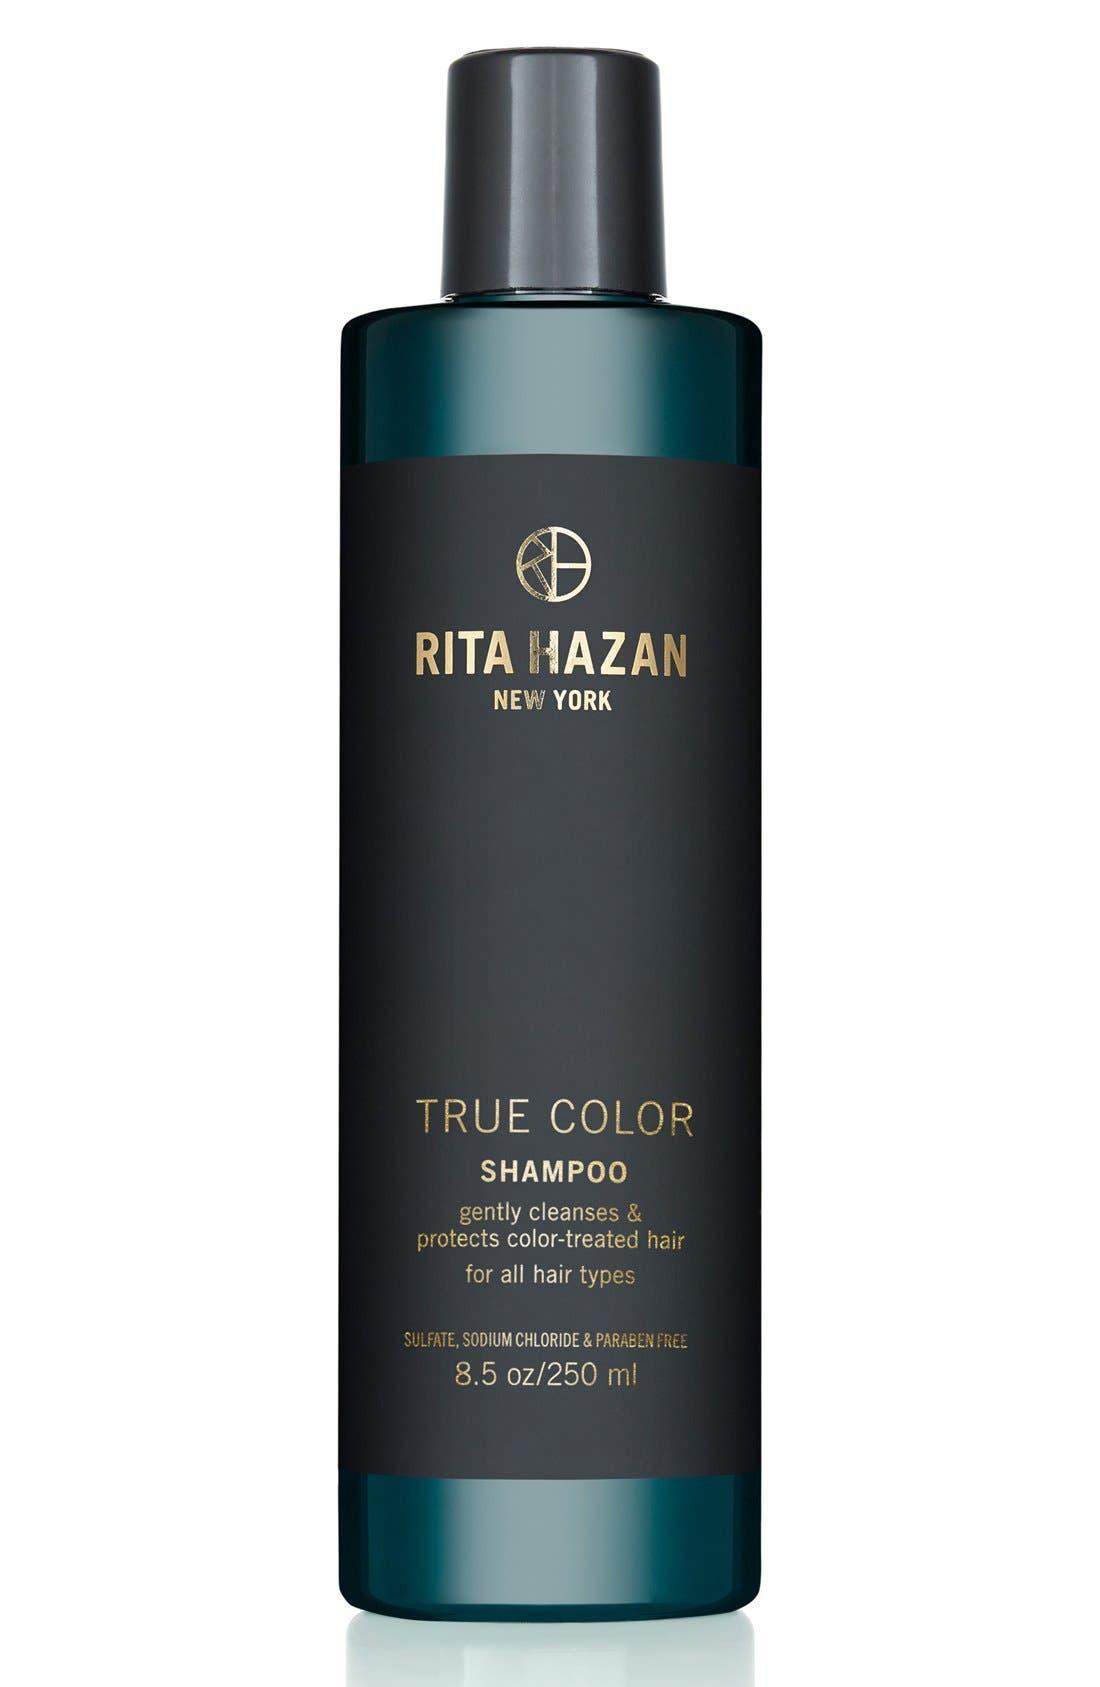 RITA HAZAN NEW YORK 'True Color' Shampoo